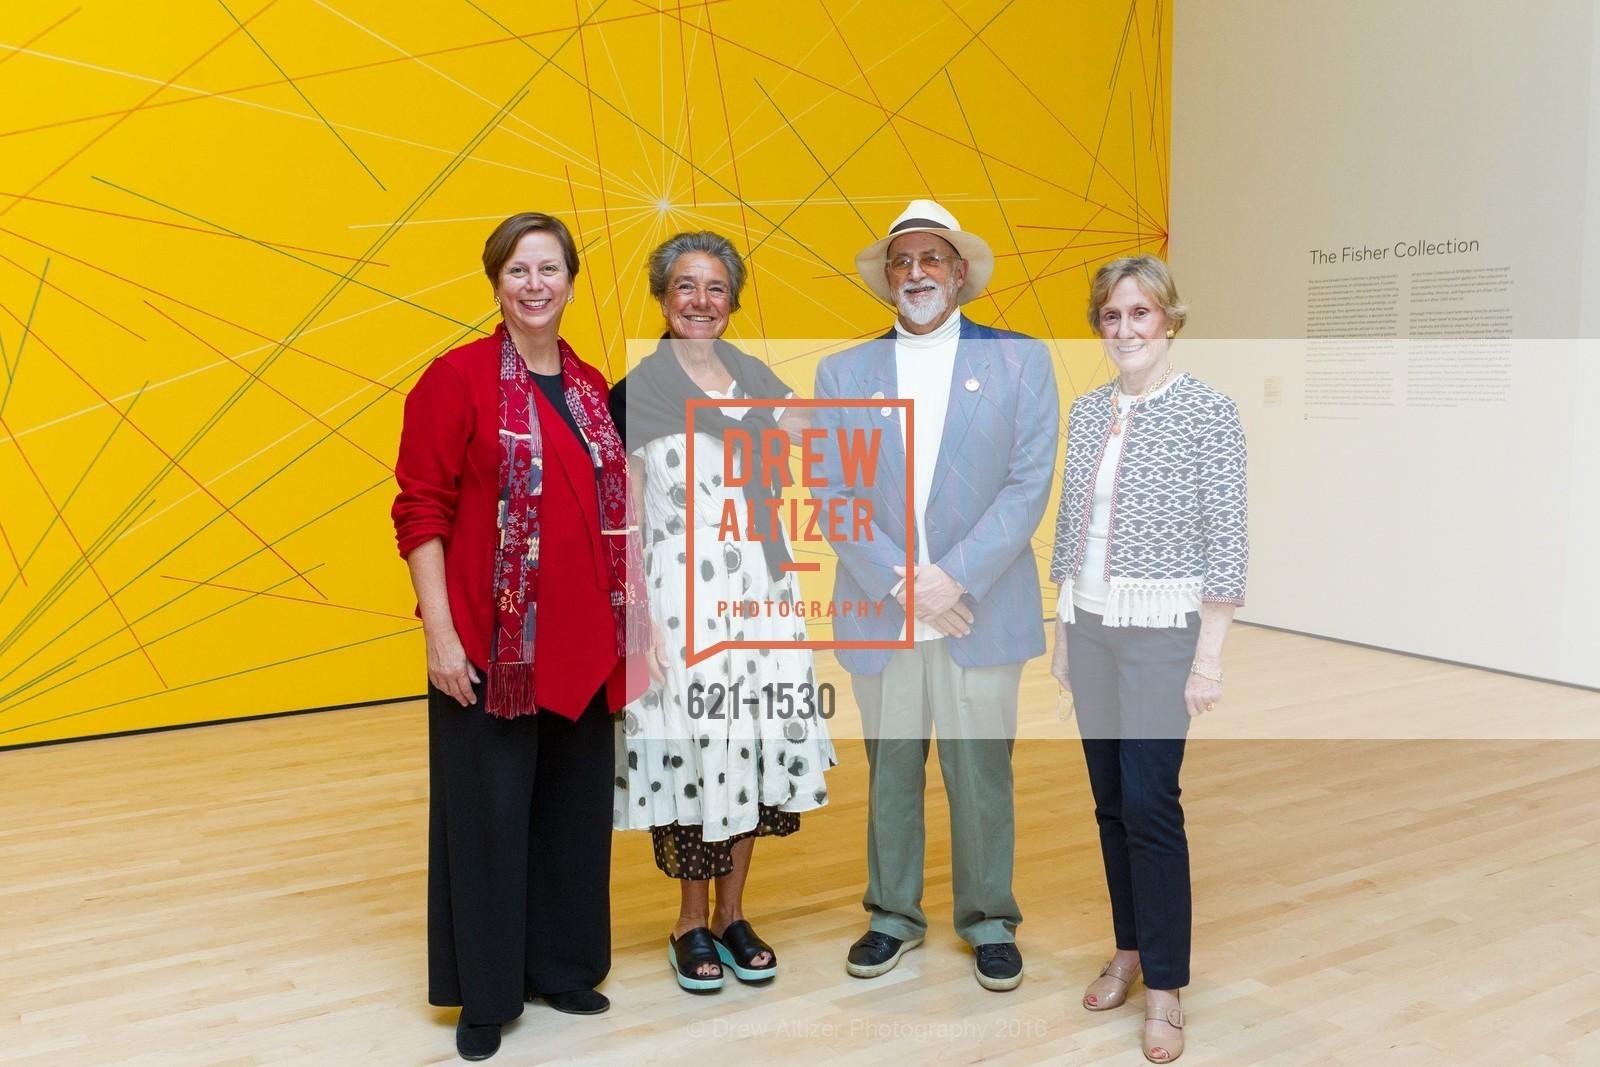 Laurie Fogarty, Patricia Unterman, Tim Savinar, Nancy Bechtle, Photo #621-1530